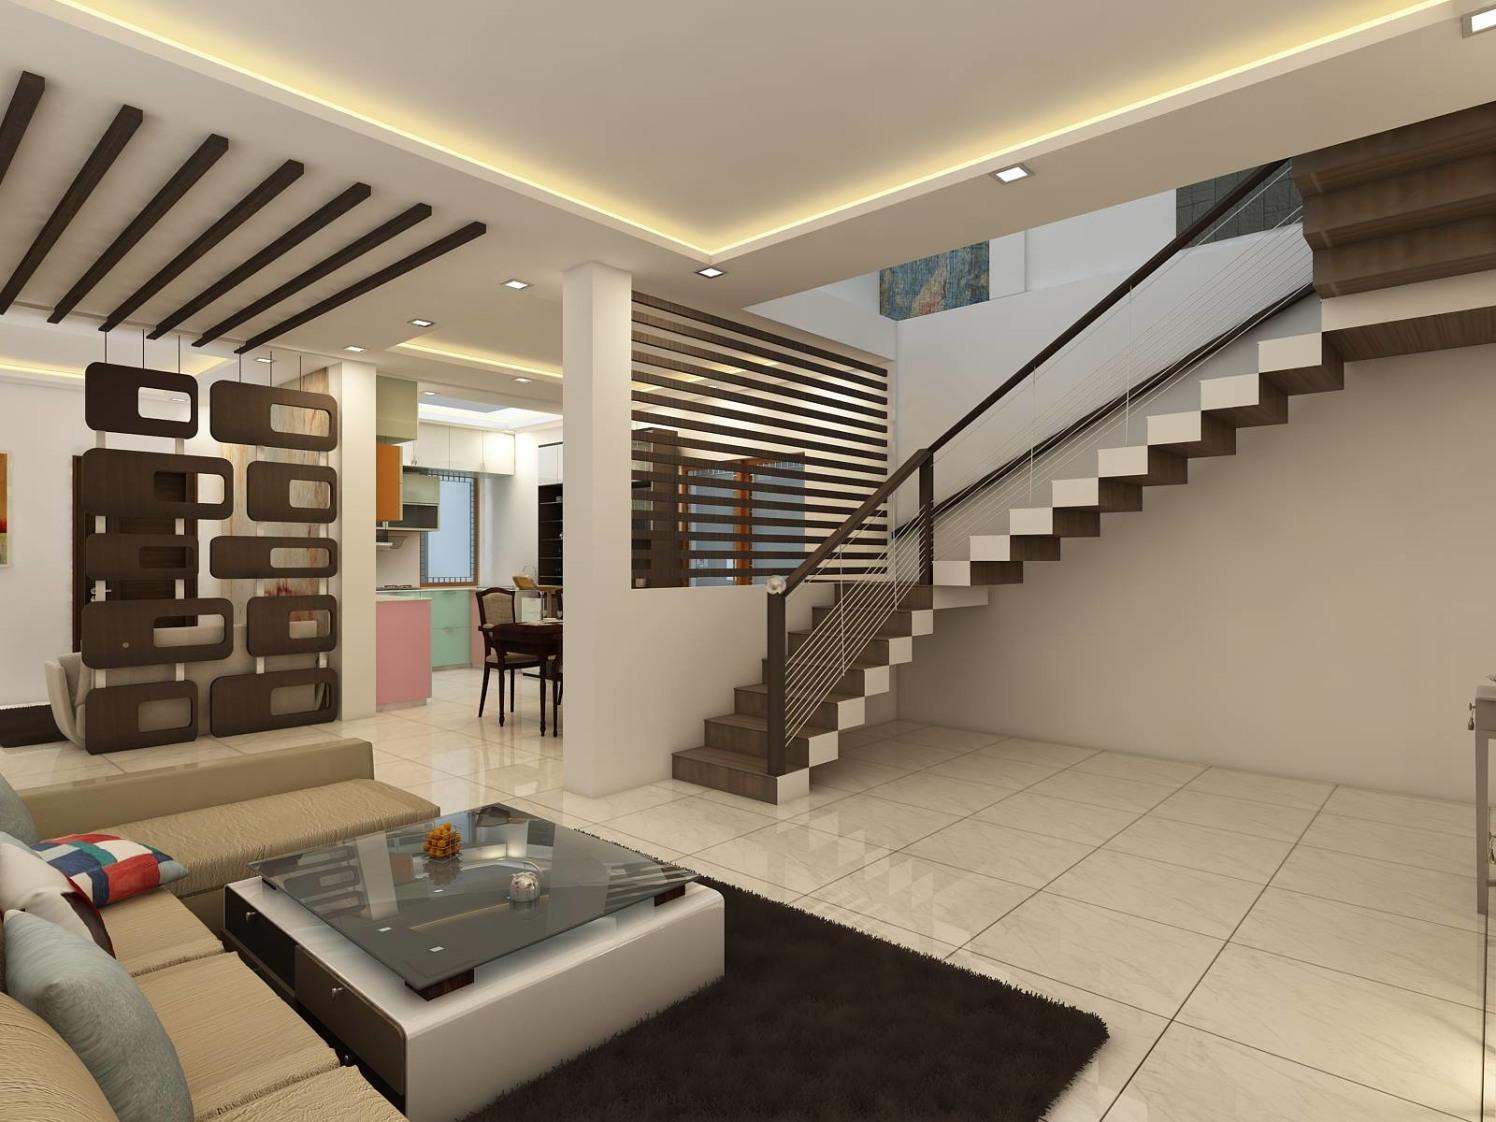 Spacious Hallway with false ceiling  and stair case by Regalias Interiors Living-room Minimalistic   Interior Design Photos & Ideas